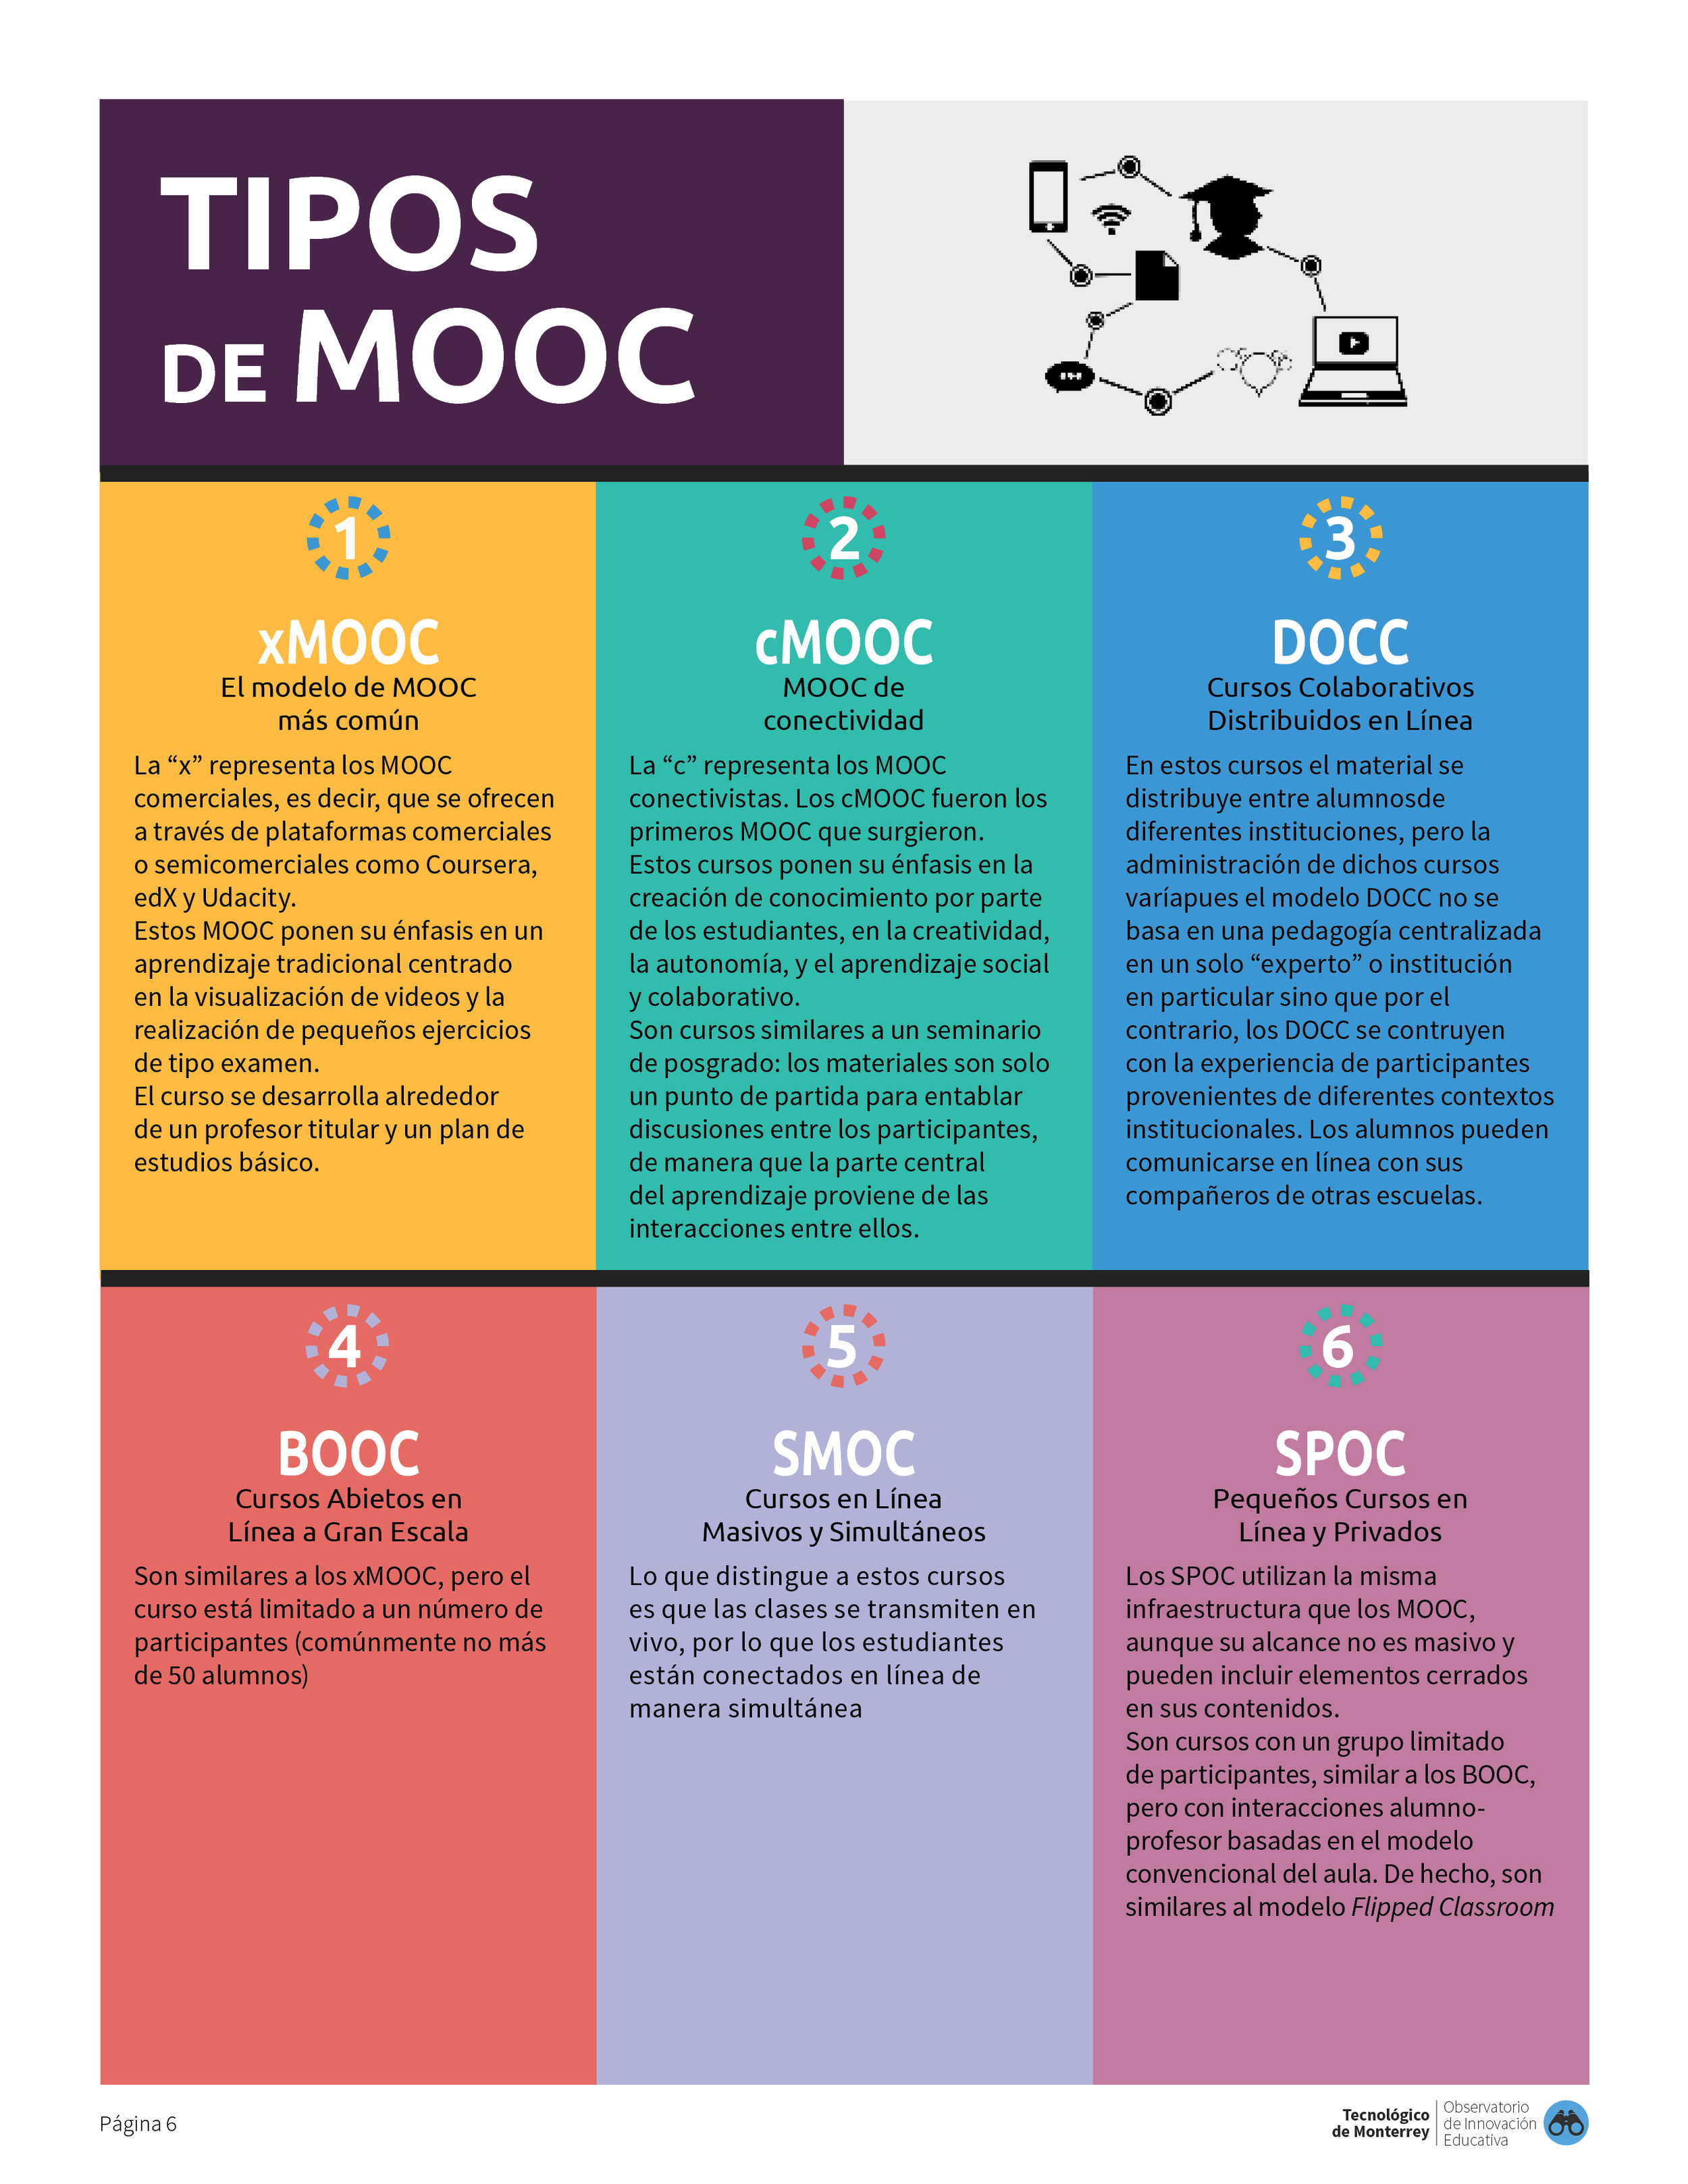 Edu Trends - MOOC6.png